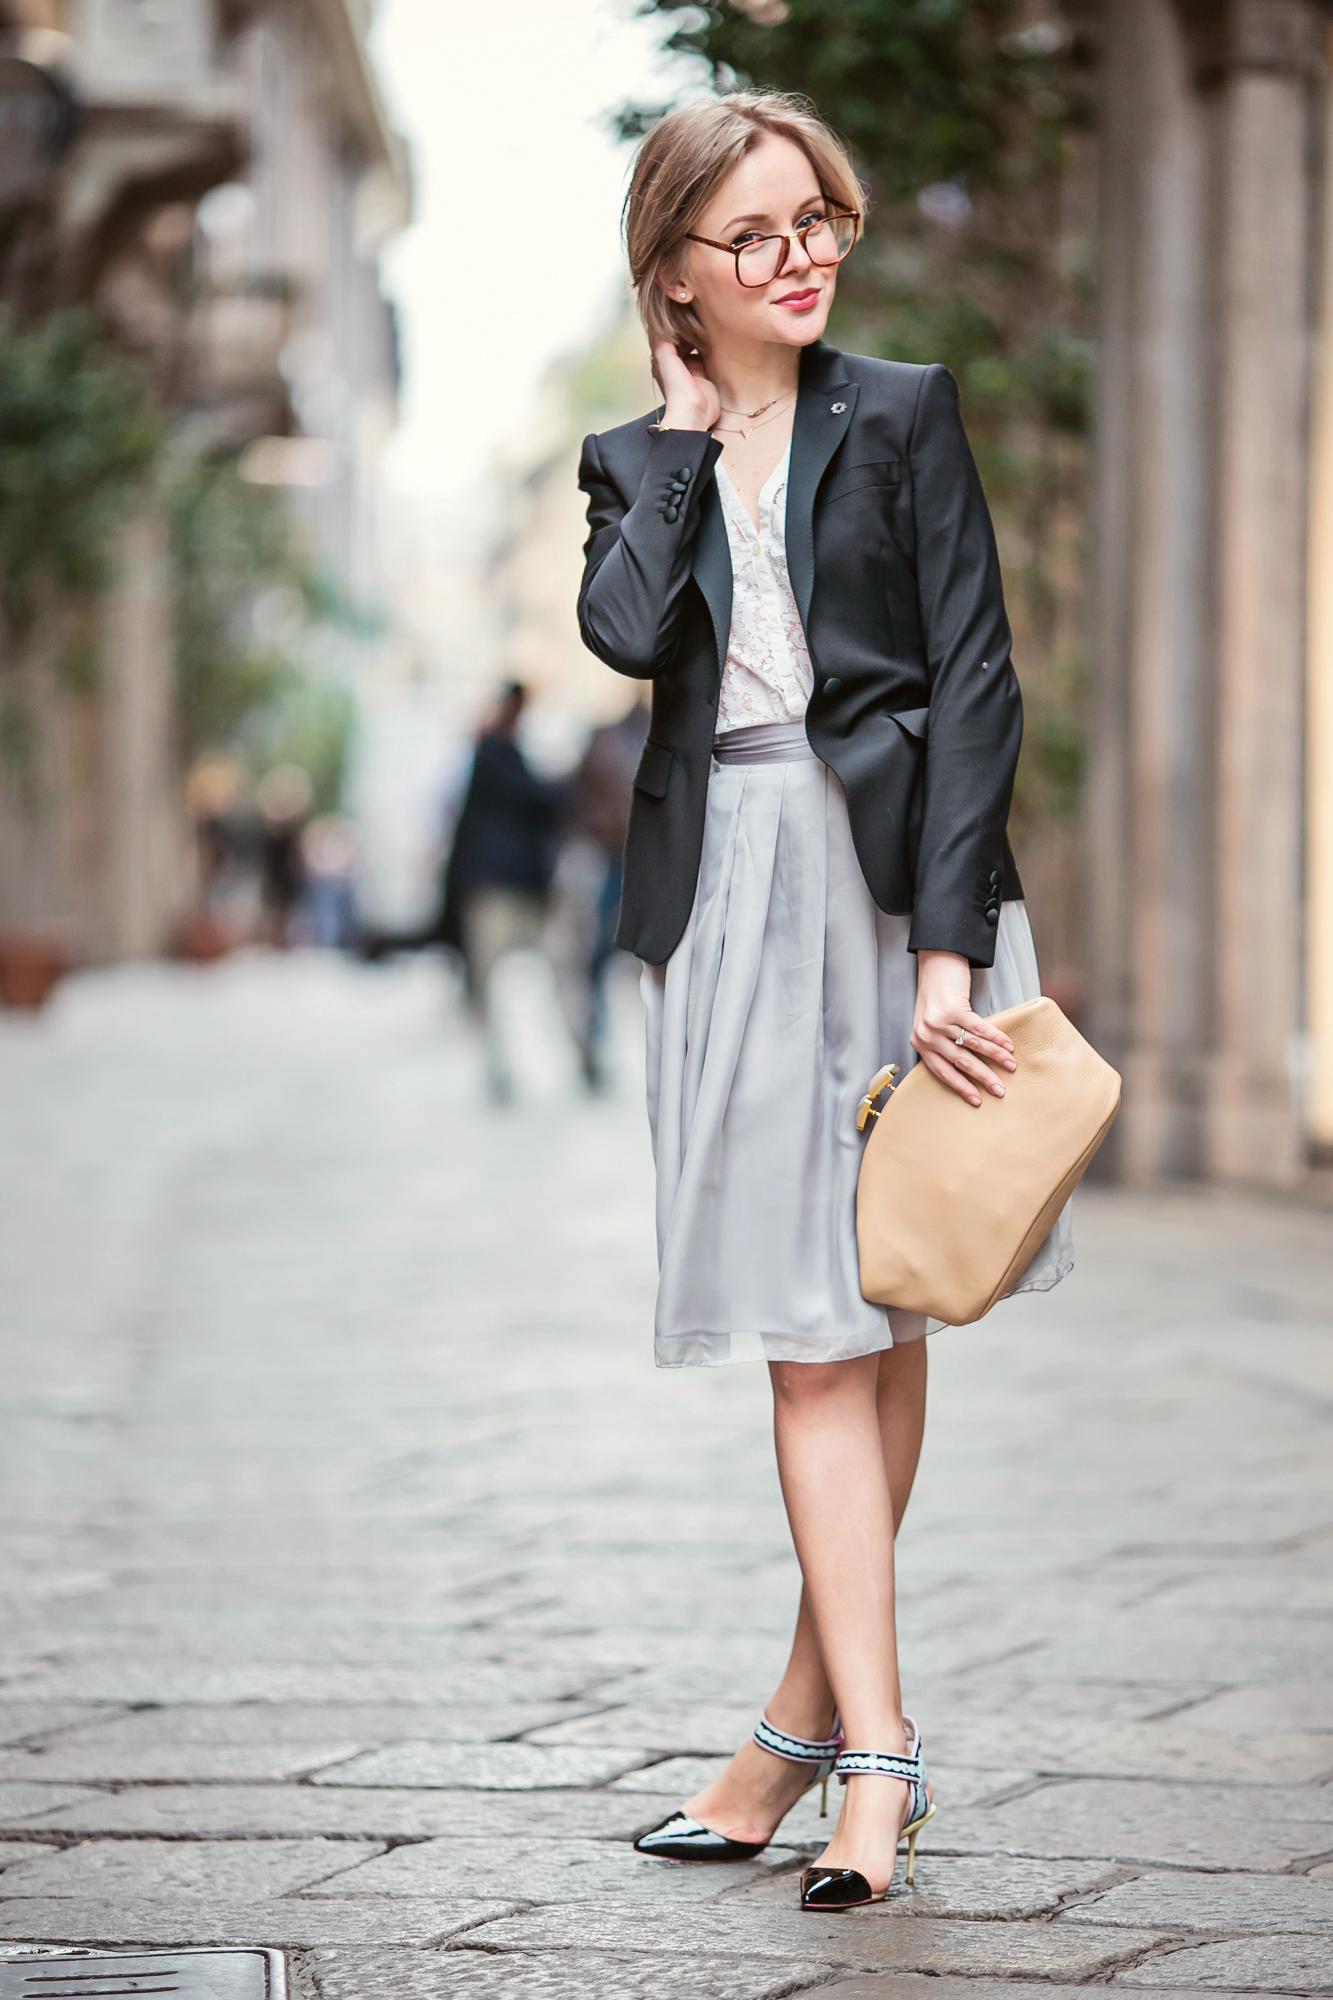 darya kamalova from thecablook com on lardini presentation in Milan and in attila showroom wearing lardini perfect black jacket with marni retro clutch and sophia webster kitten heels-42 copy